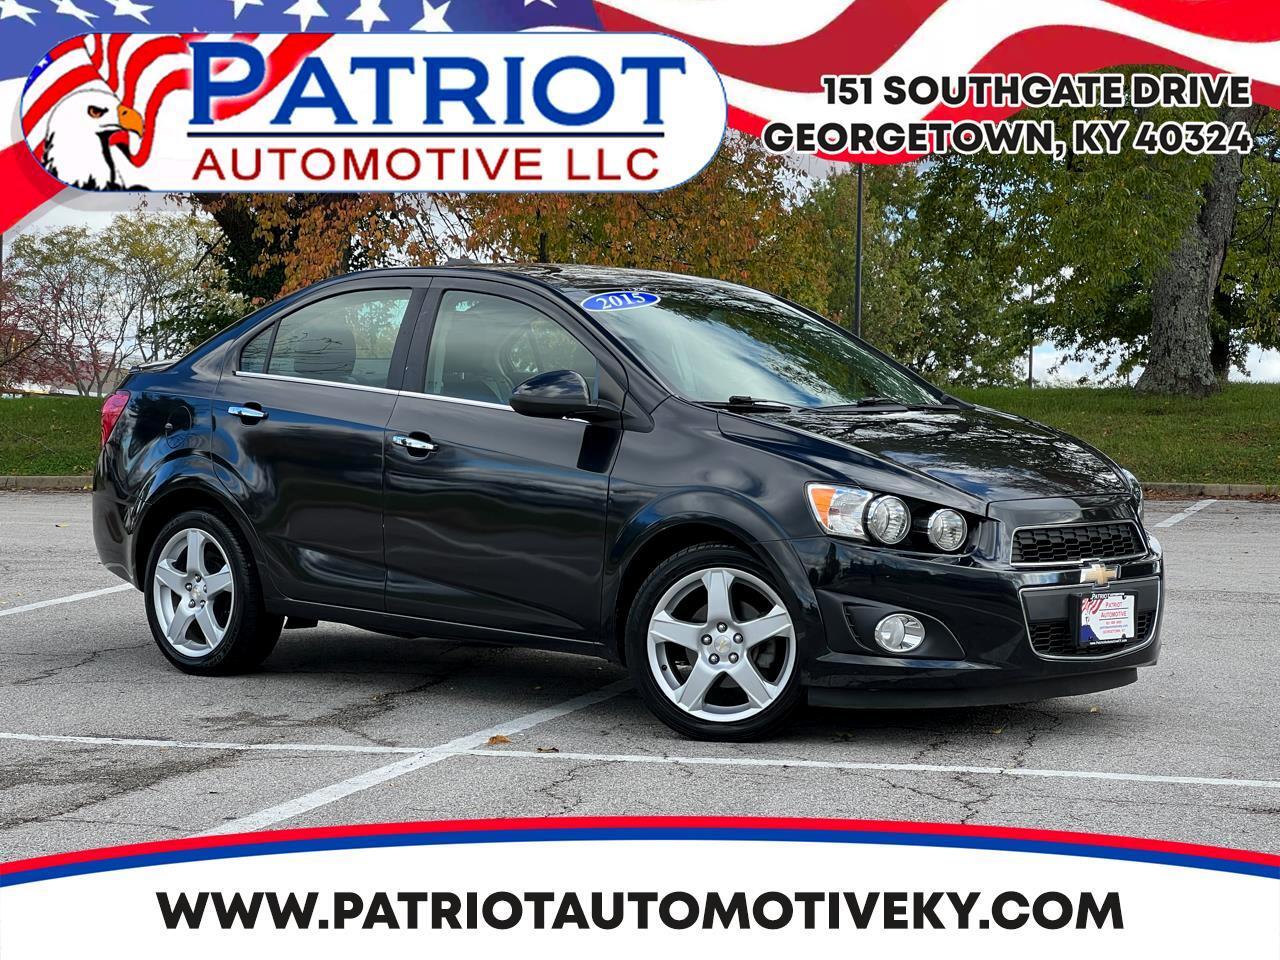 2015 Chevrolet Sonic 4dr Sdn Auto LTZ